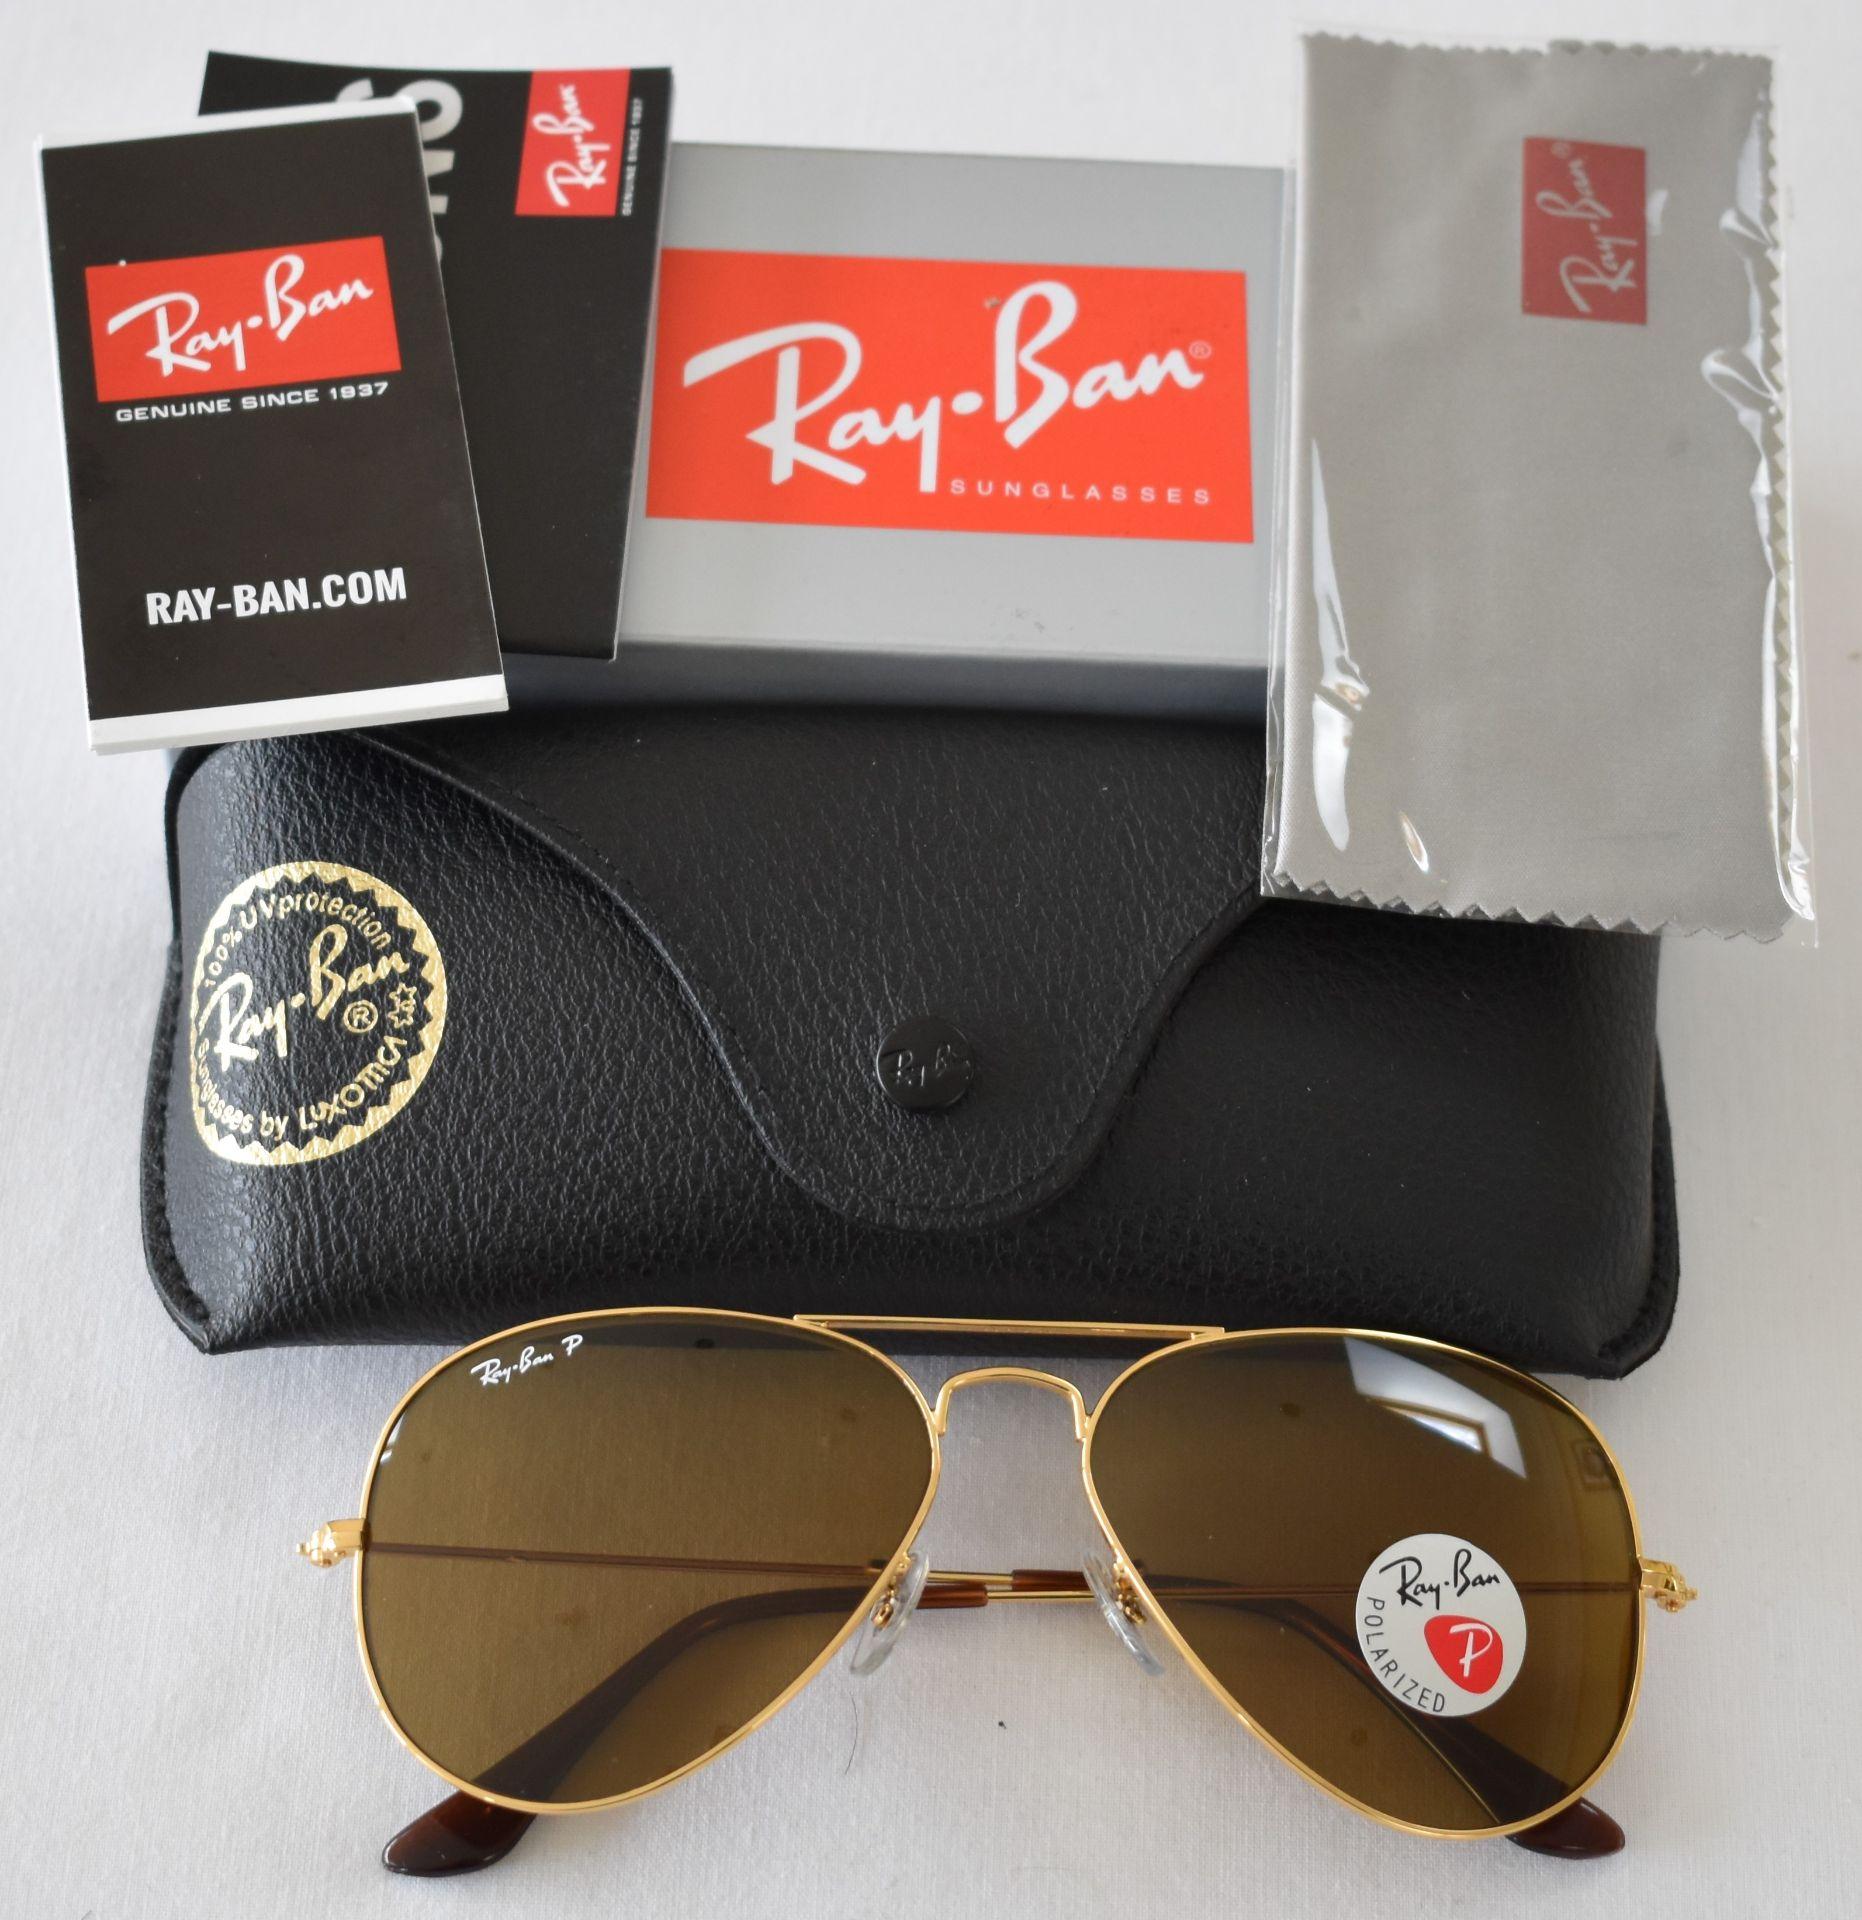 Ray Ban Sunglasses ORB3025 001/57 *3P